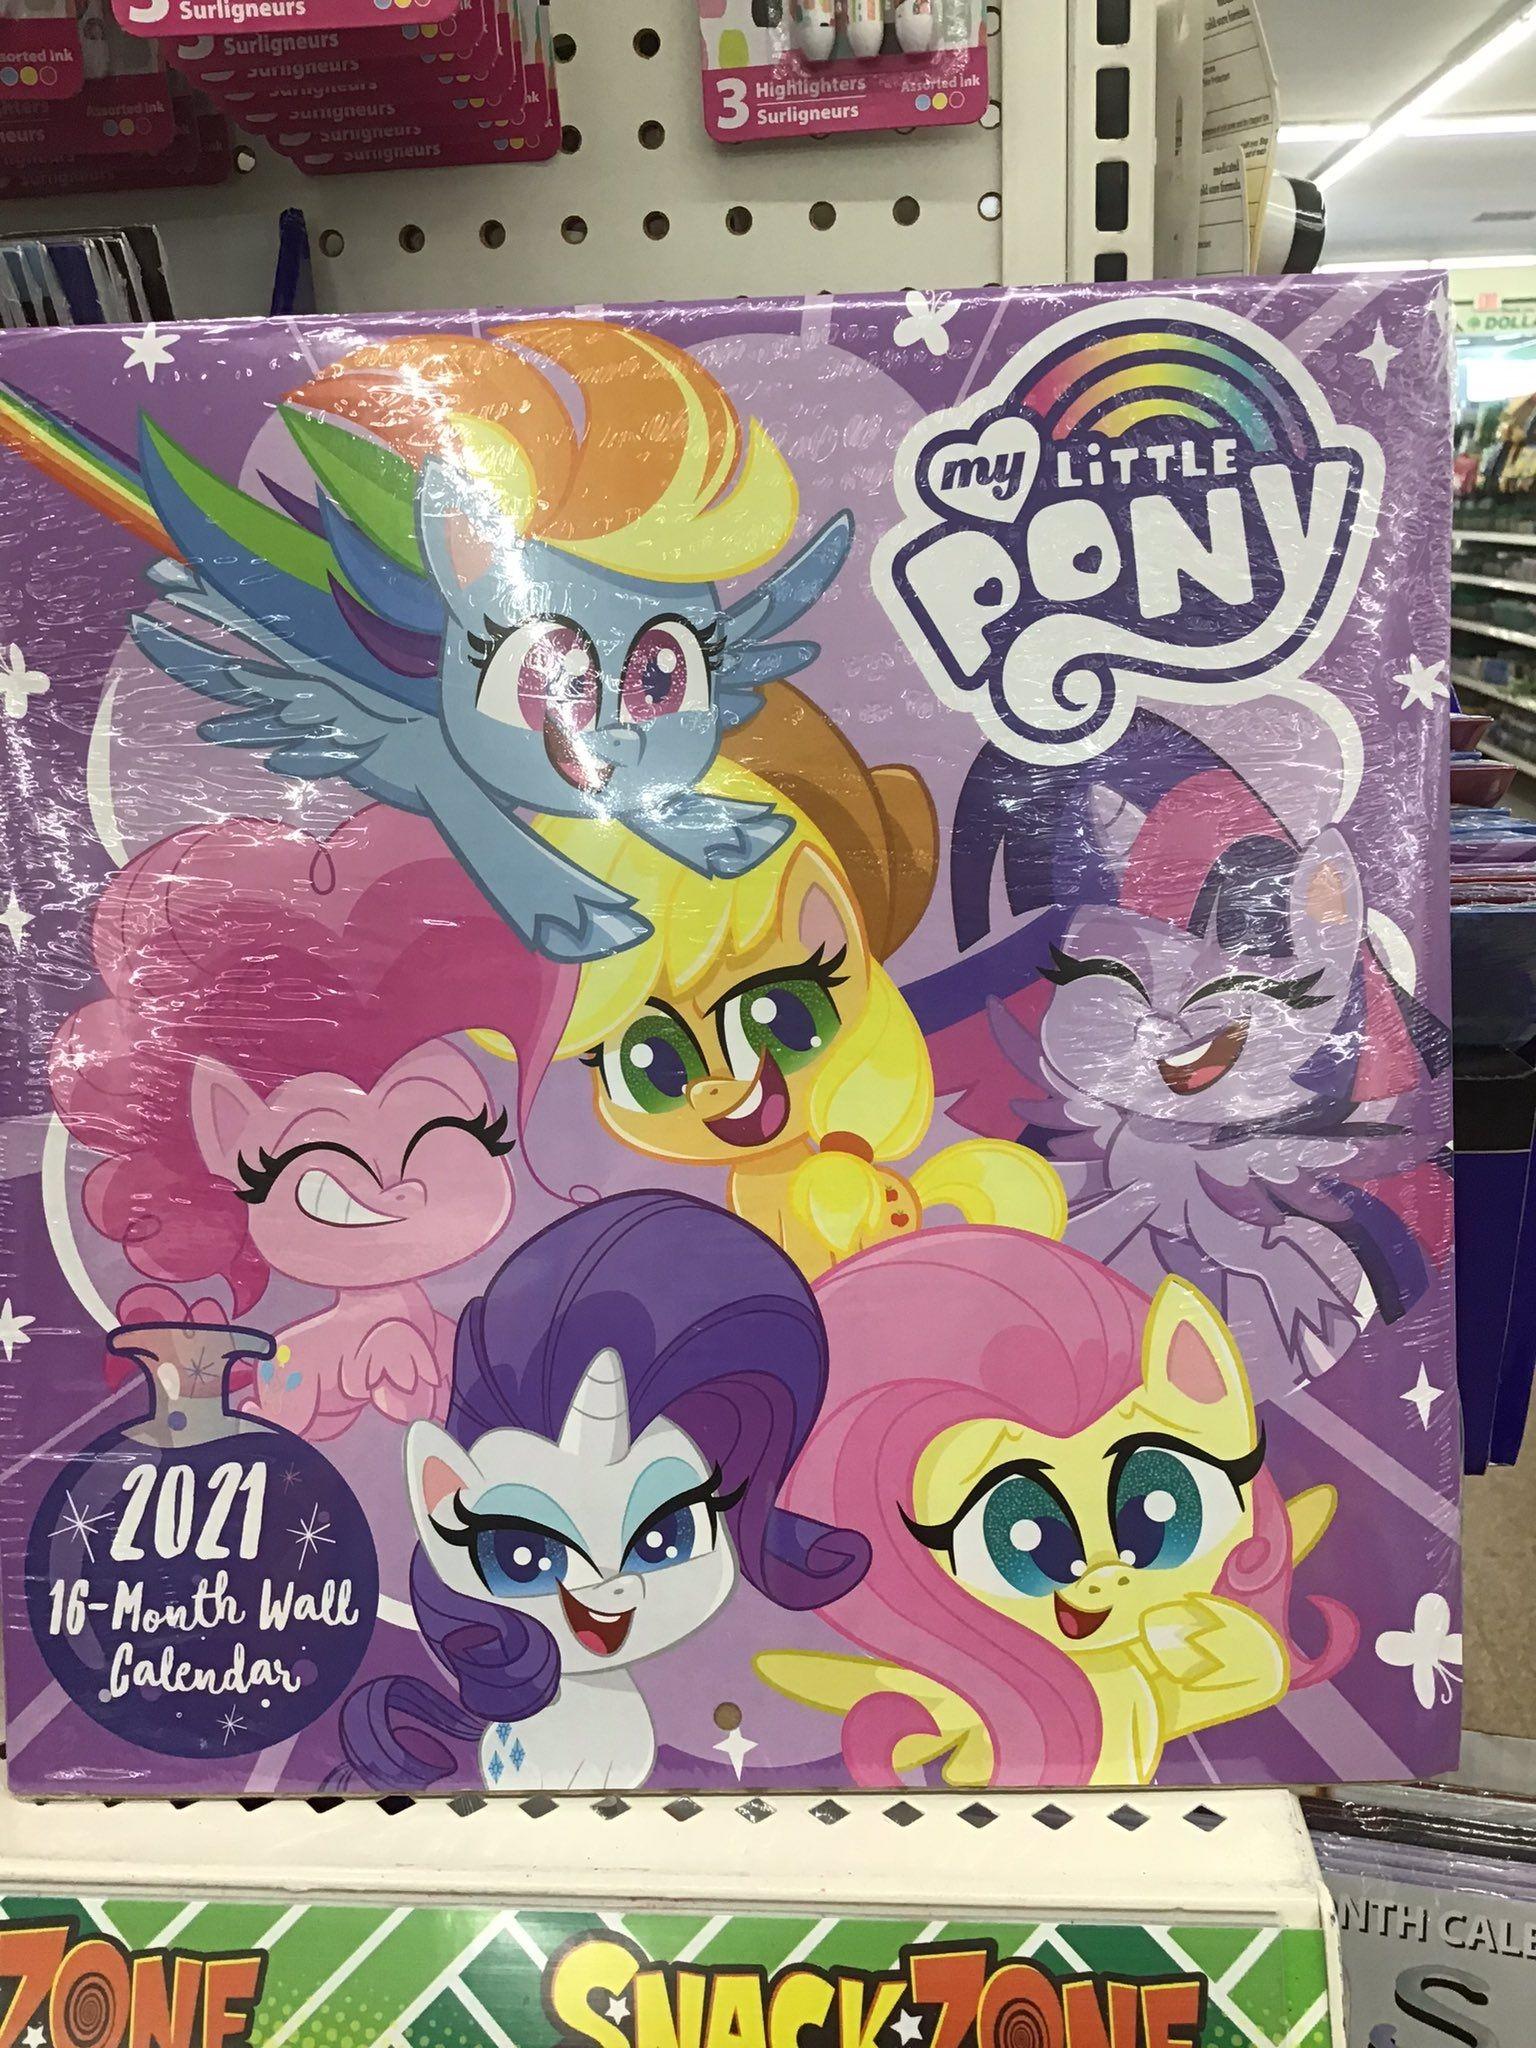 Equestria Daily - Mlp Stuff!: New Pony Life 2021 Calendar